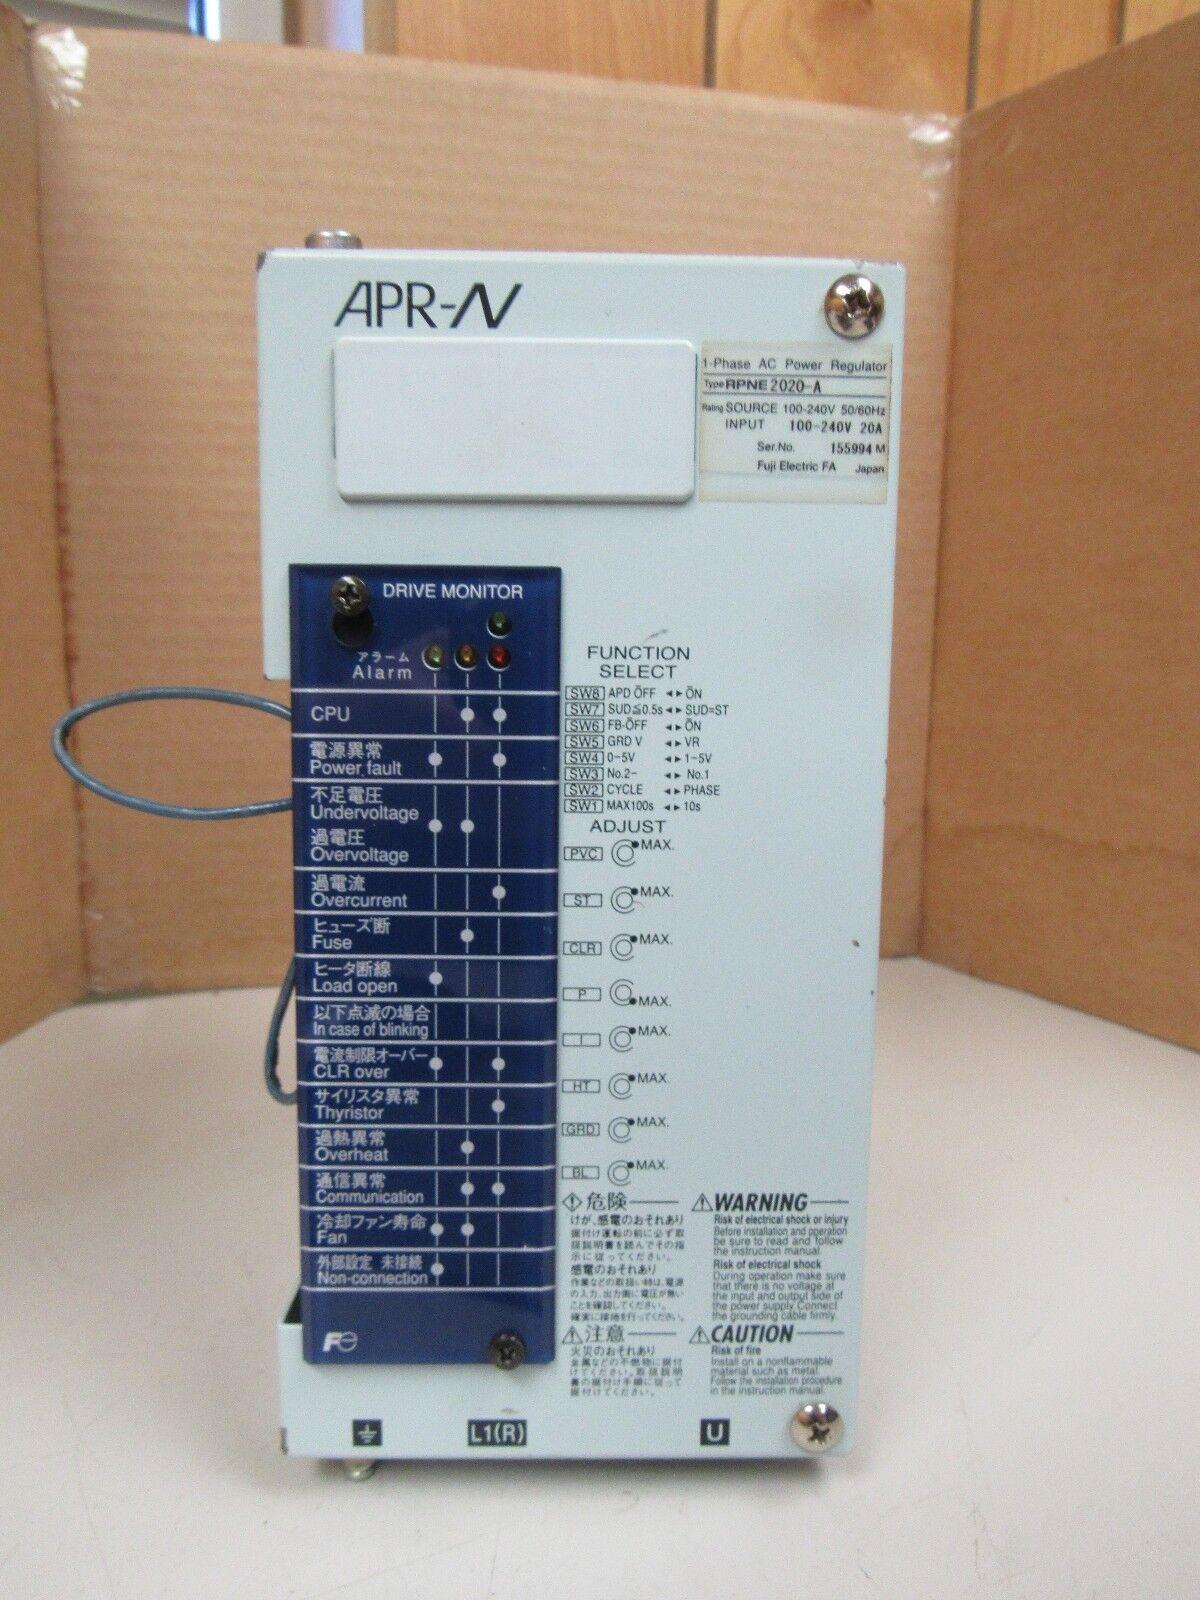 best regulators 2020 Fuji AC Power Regulator Rpne 2020 a RPNE2020A Ser Apr n 1ph 240v